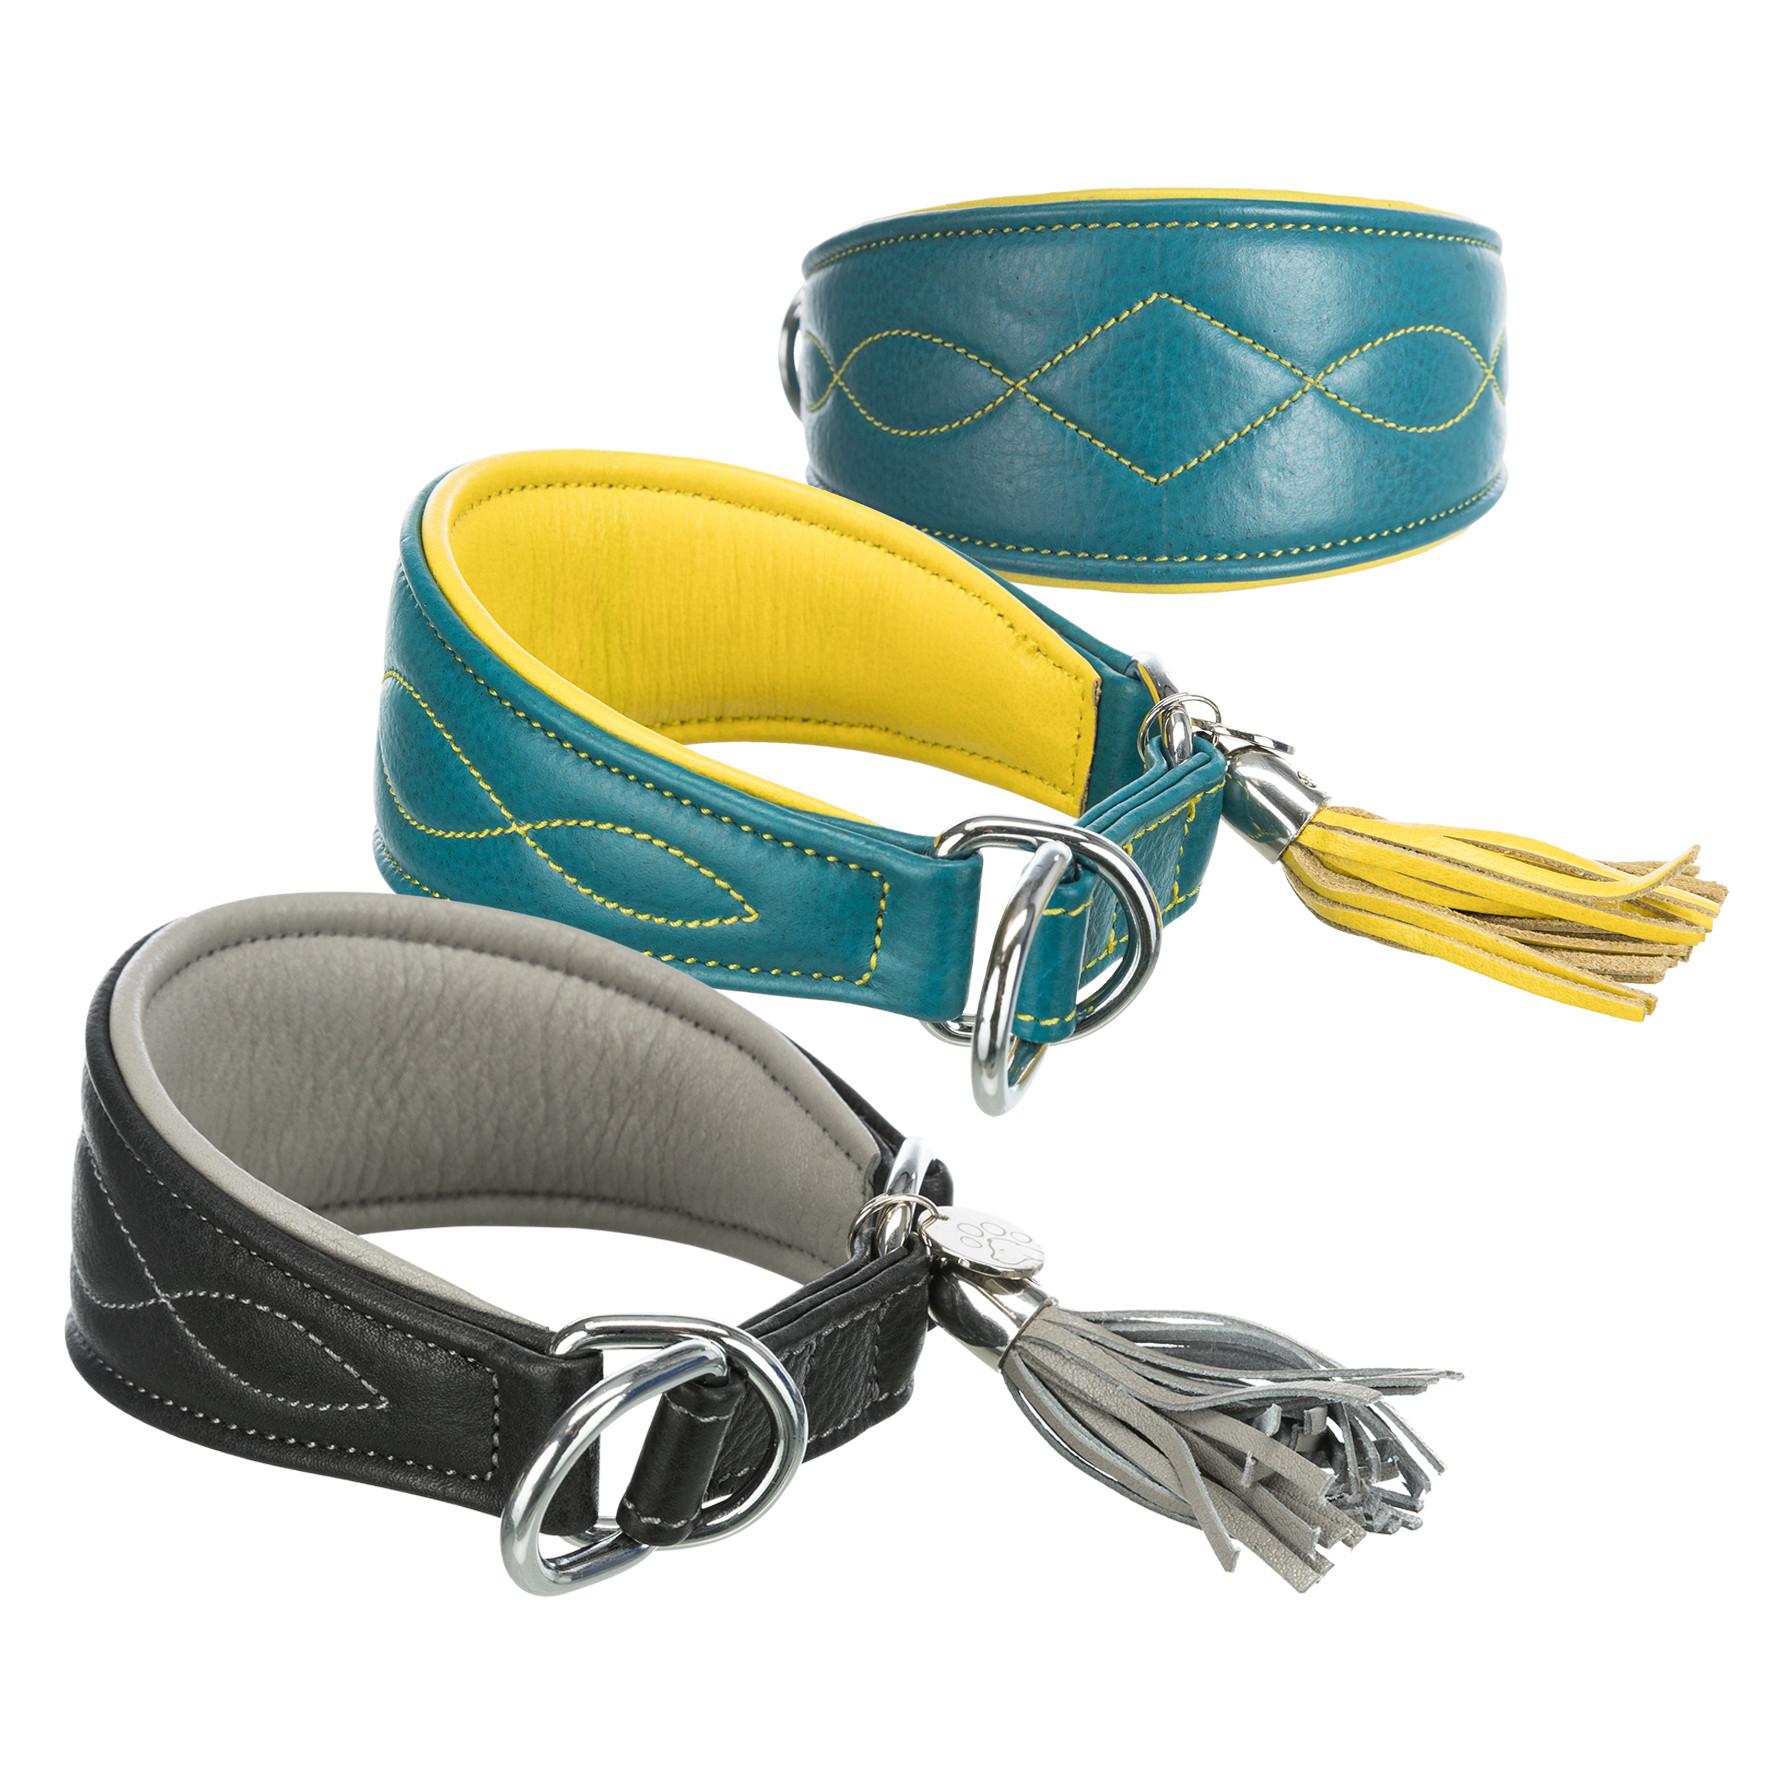 TRIXIE Active Comfort Halsband für Windhunde, Leder TRIXIE Active Comfort Halsband für Windhunde, Leder, S: 27–35 cm/55 mm, petrol/gelb